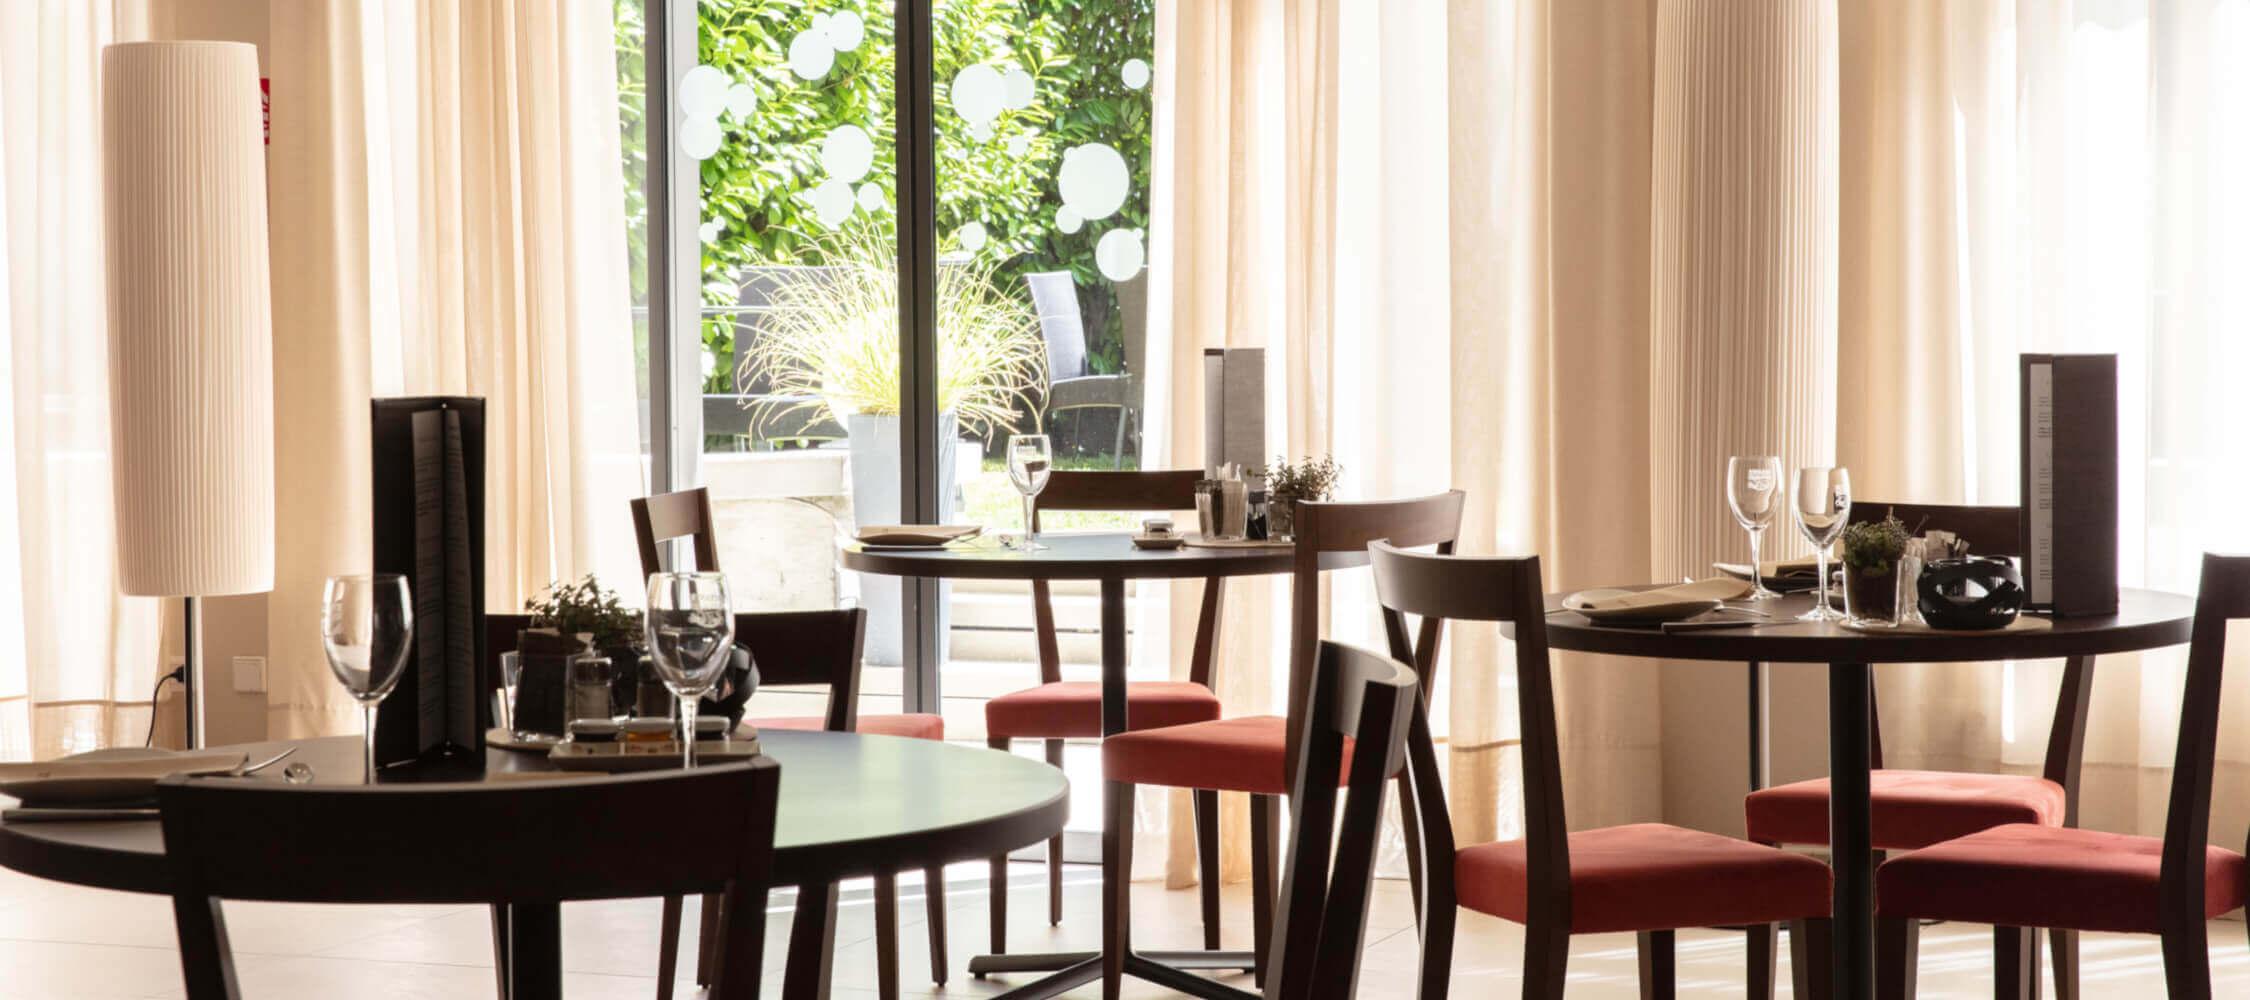 City_Hotel_Merano_Restaurant_City_BeatricePilotto_3T1A2083_2250x1000